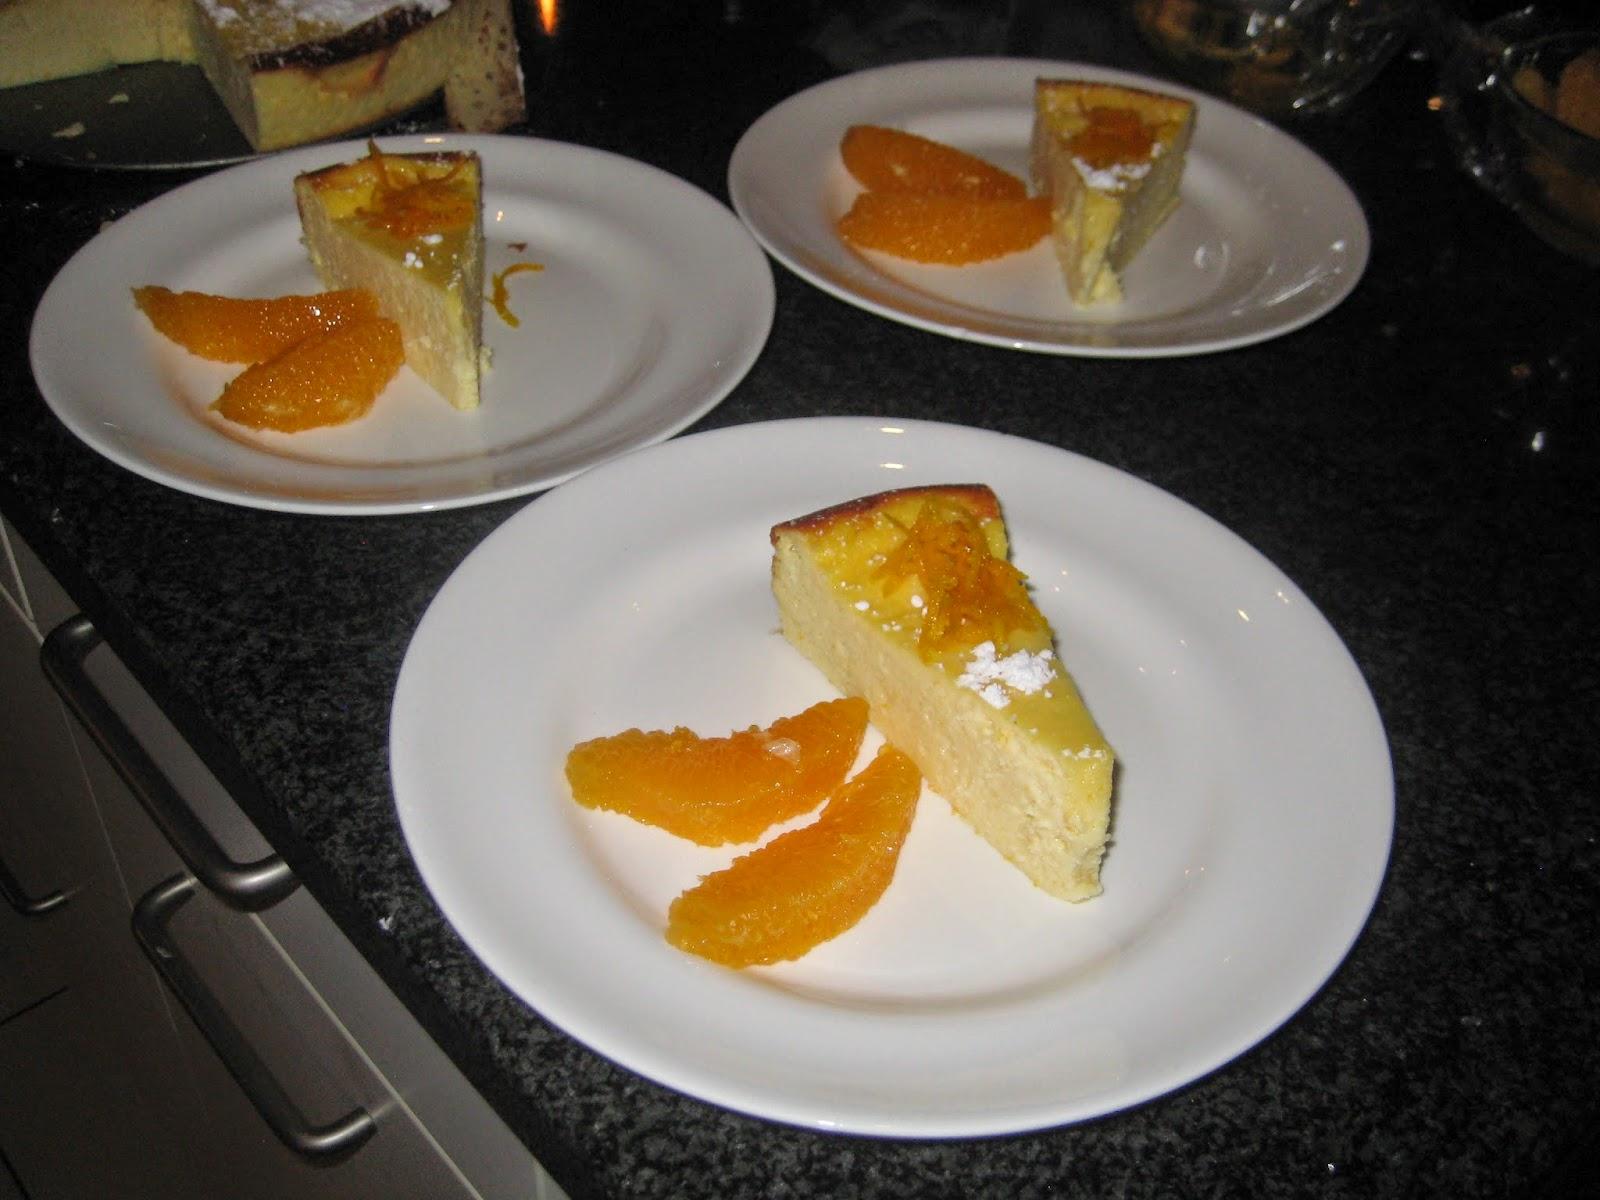 Laura's Gourmandises: Orange blossom-flavored ricotta cheesecake